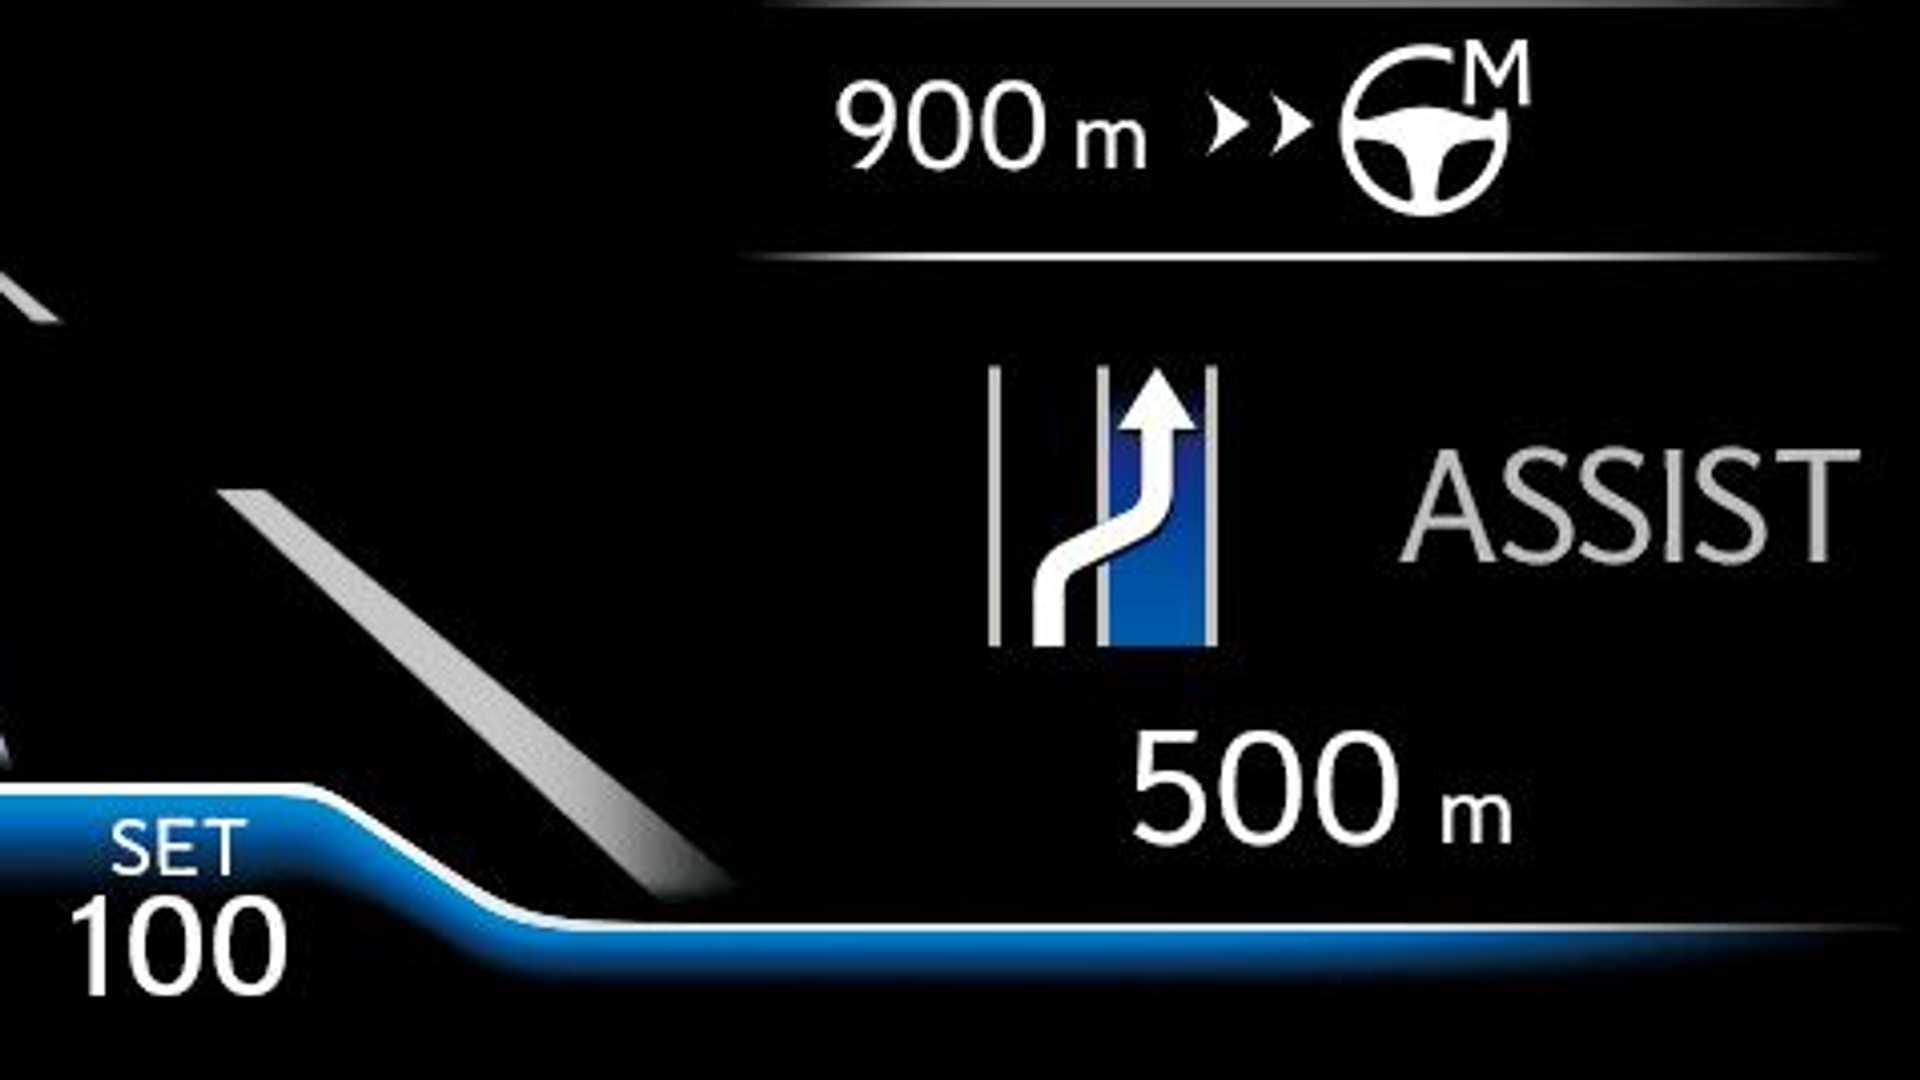 Lexus-LS-And-Toyota-Mirai-Advanced-Drive-19